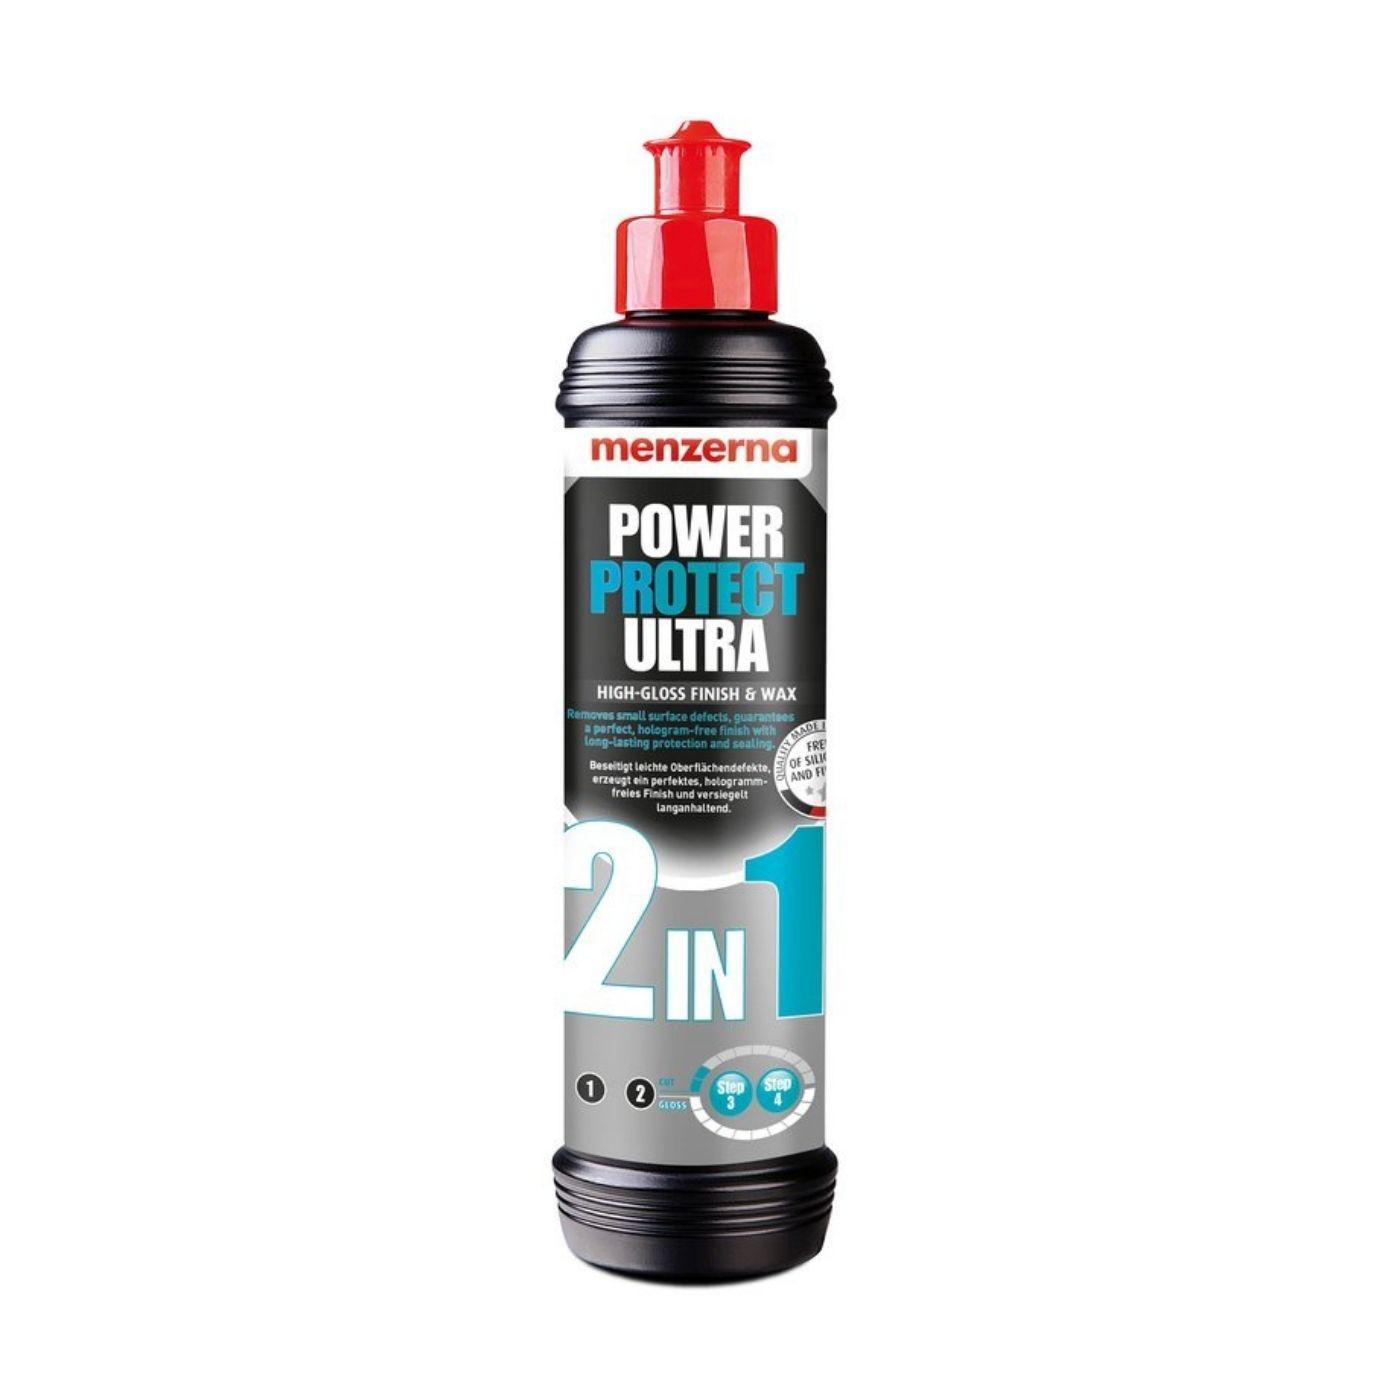 Polerförsegling Menzerna Power Protect Ultra 2in1, 1000 ml